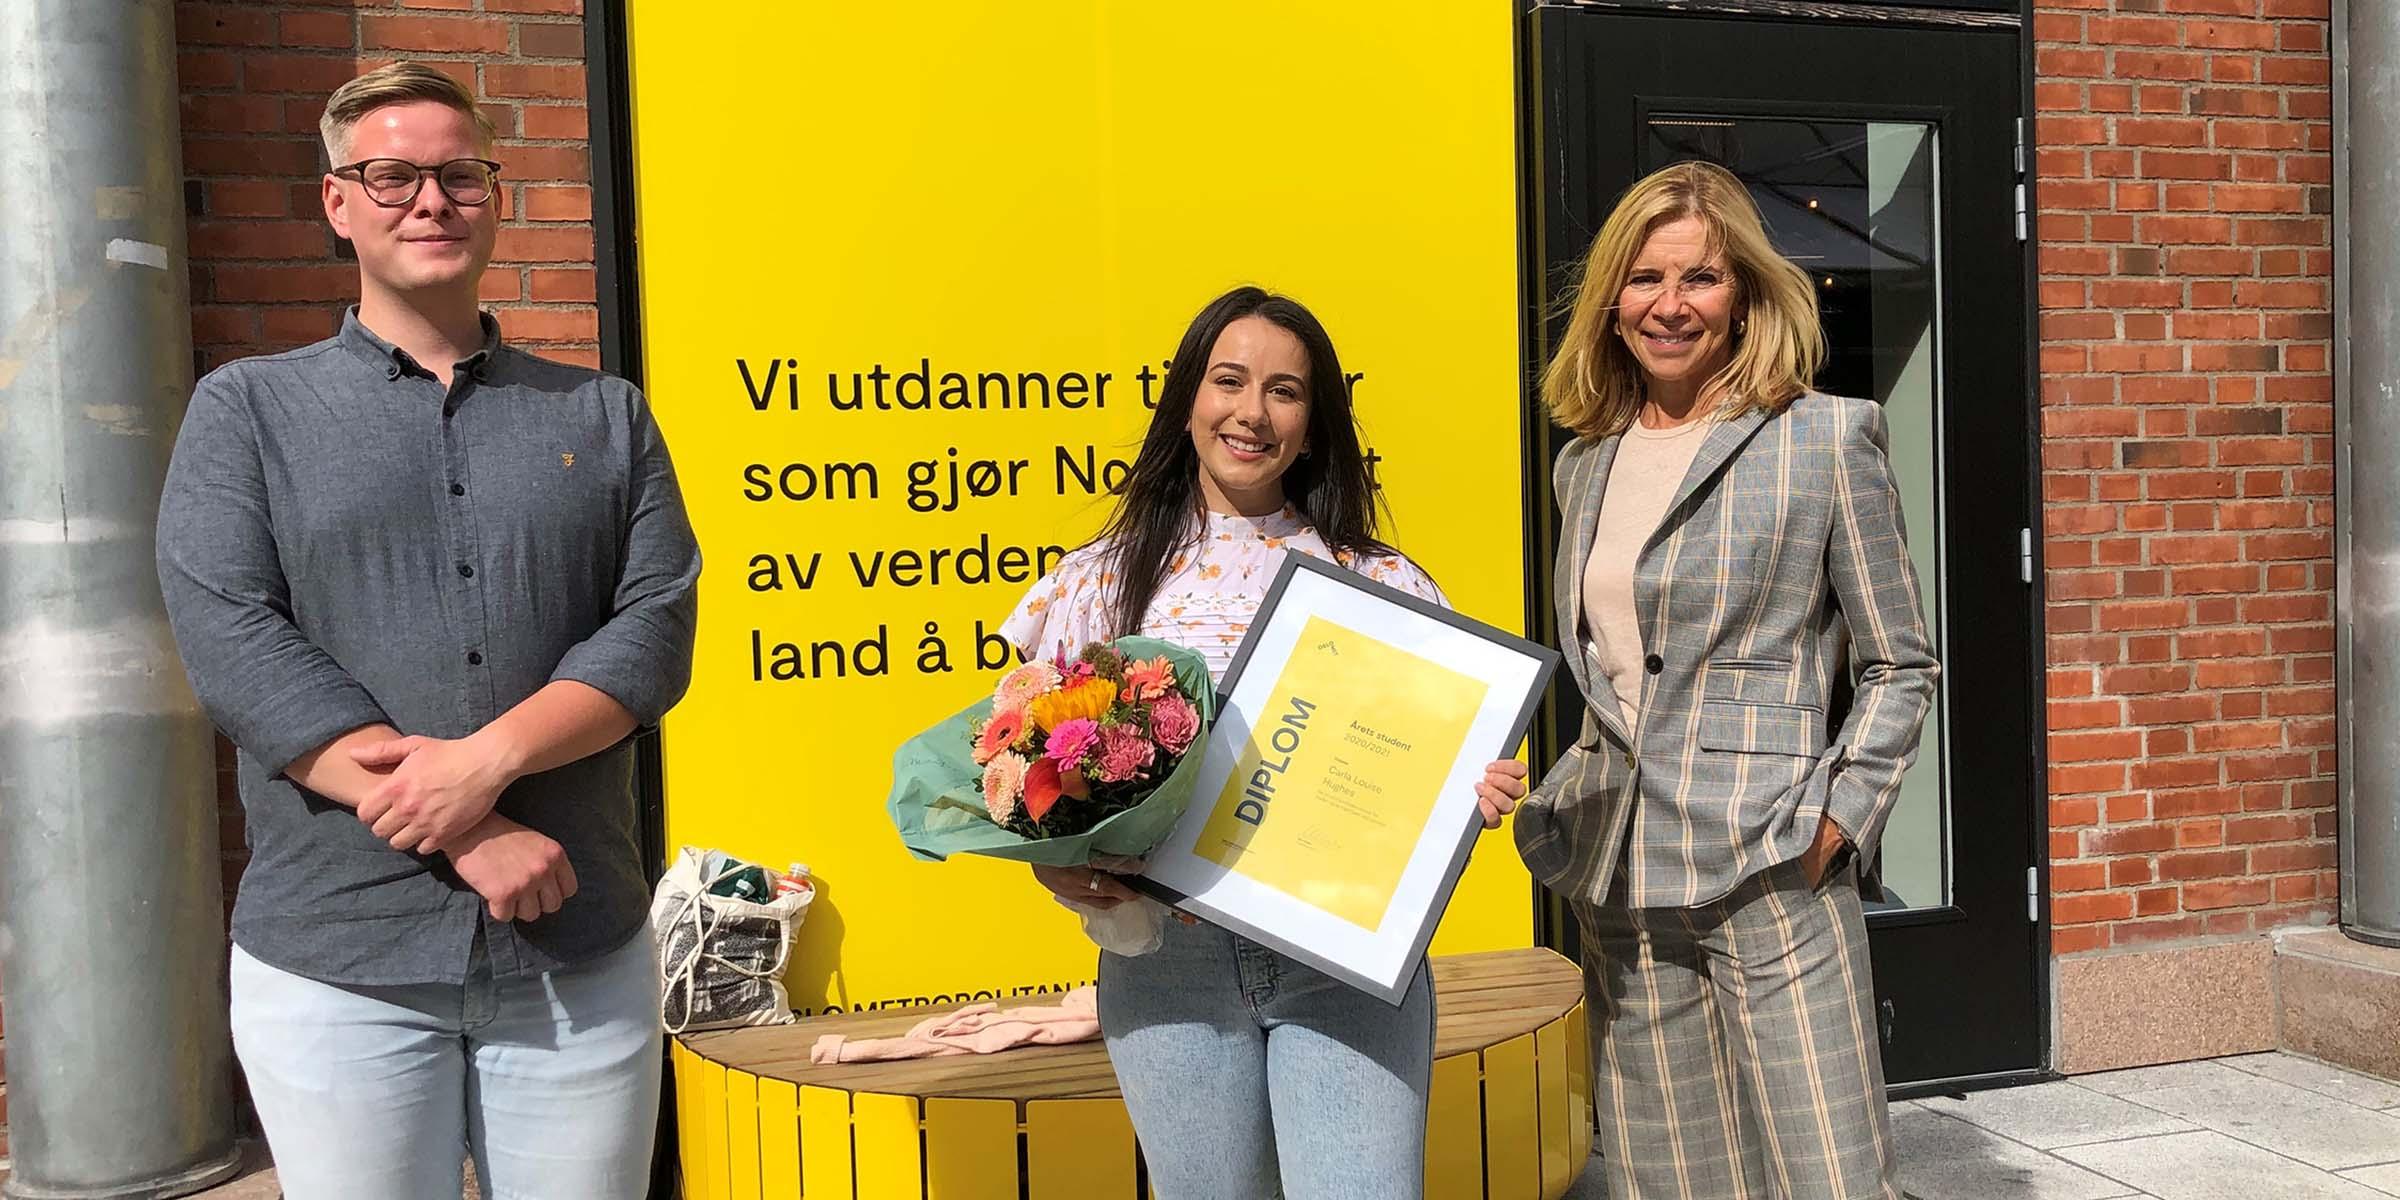 Carla Luise Hughes sammen med Rolf Martin Aspenes og Nina Waaler foran en gul vegg på OsloMet